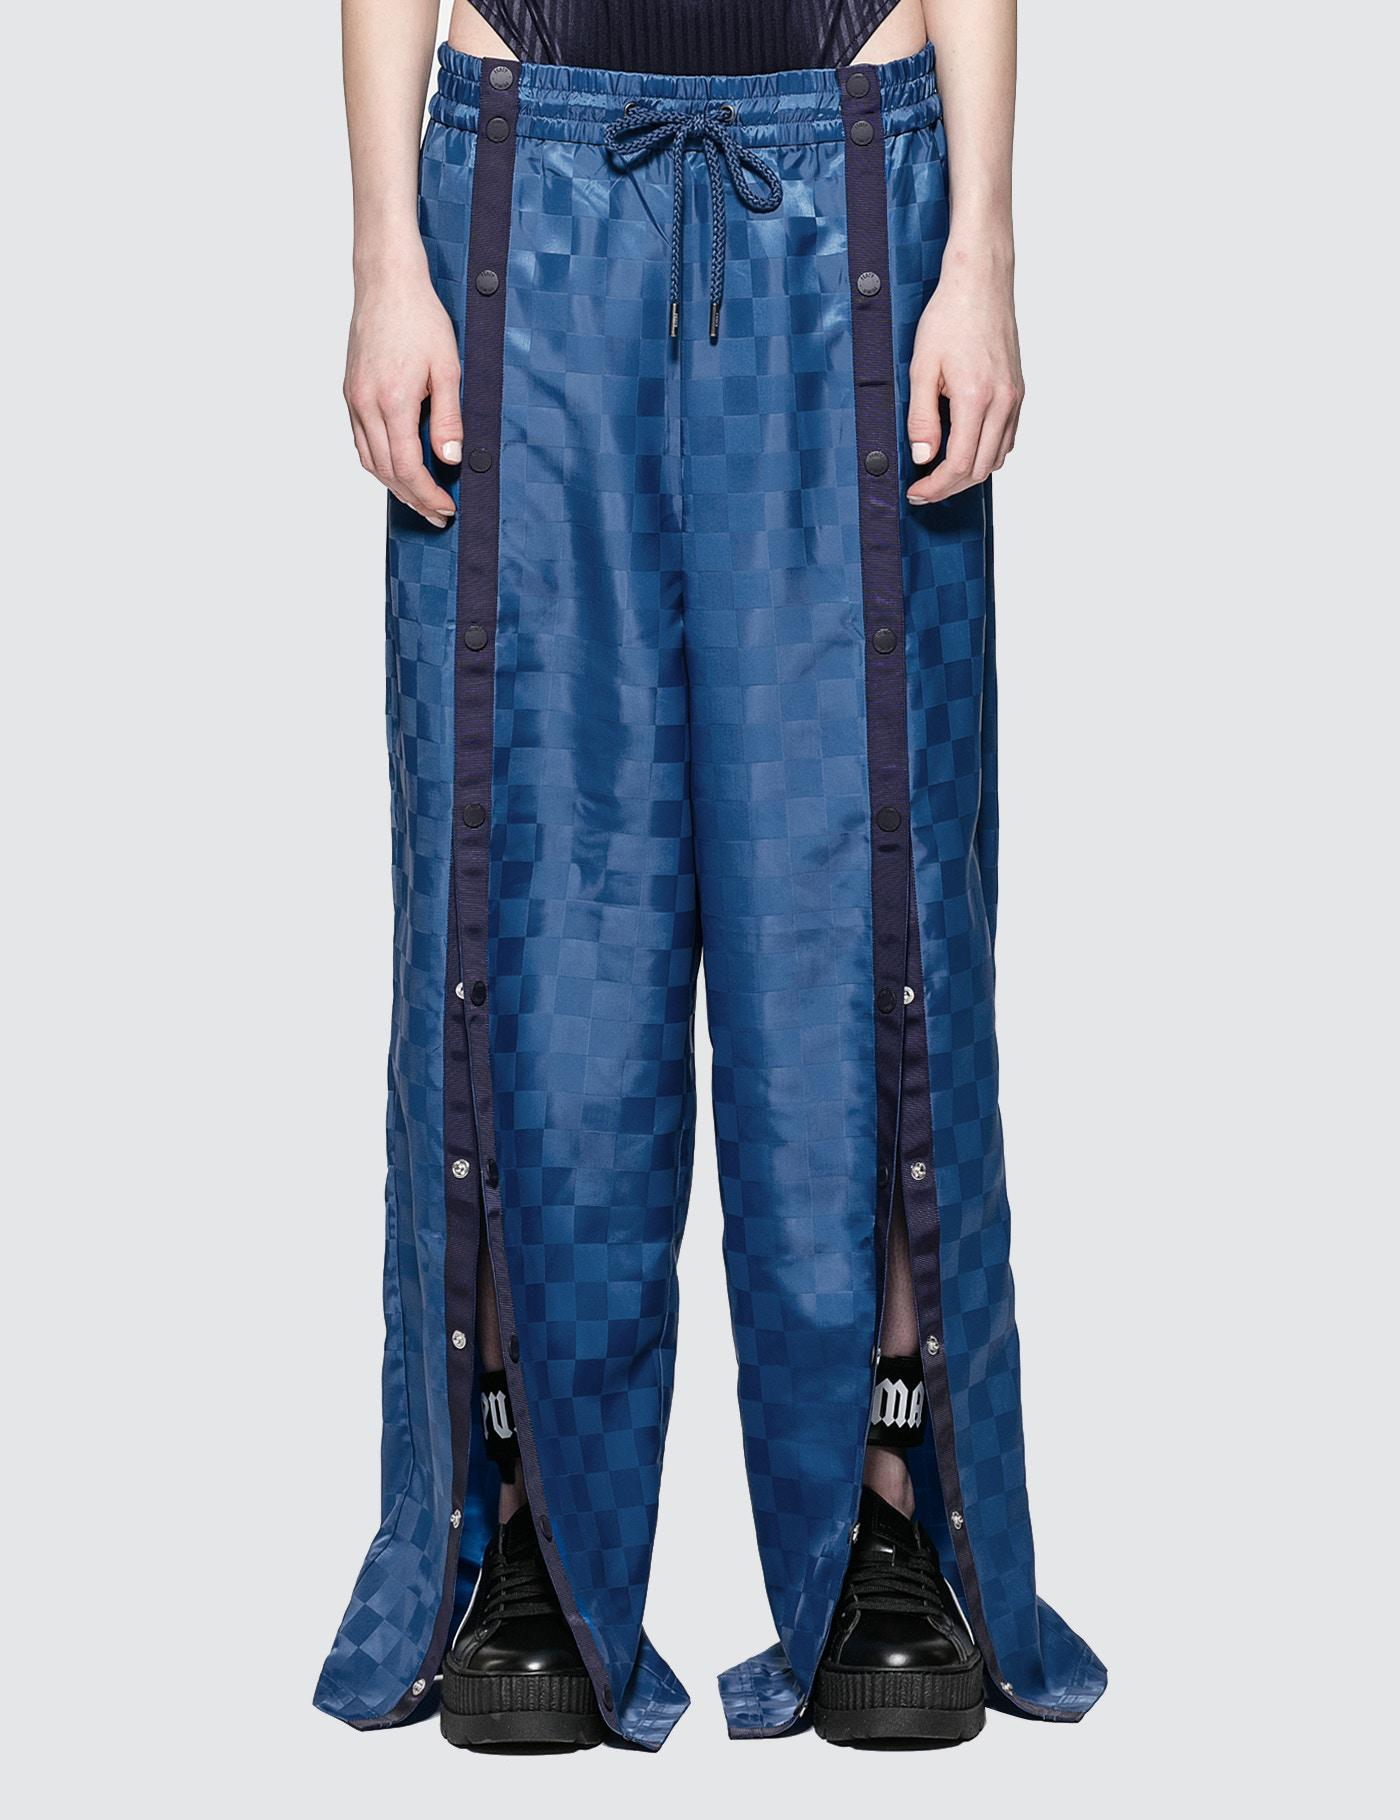 773b7e97287 PUMA Fenty By Rihanna Front Tearaway Track Pants in Blue - Lyst